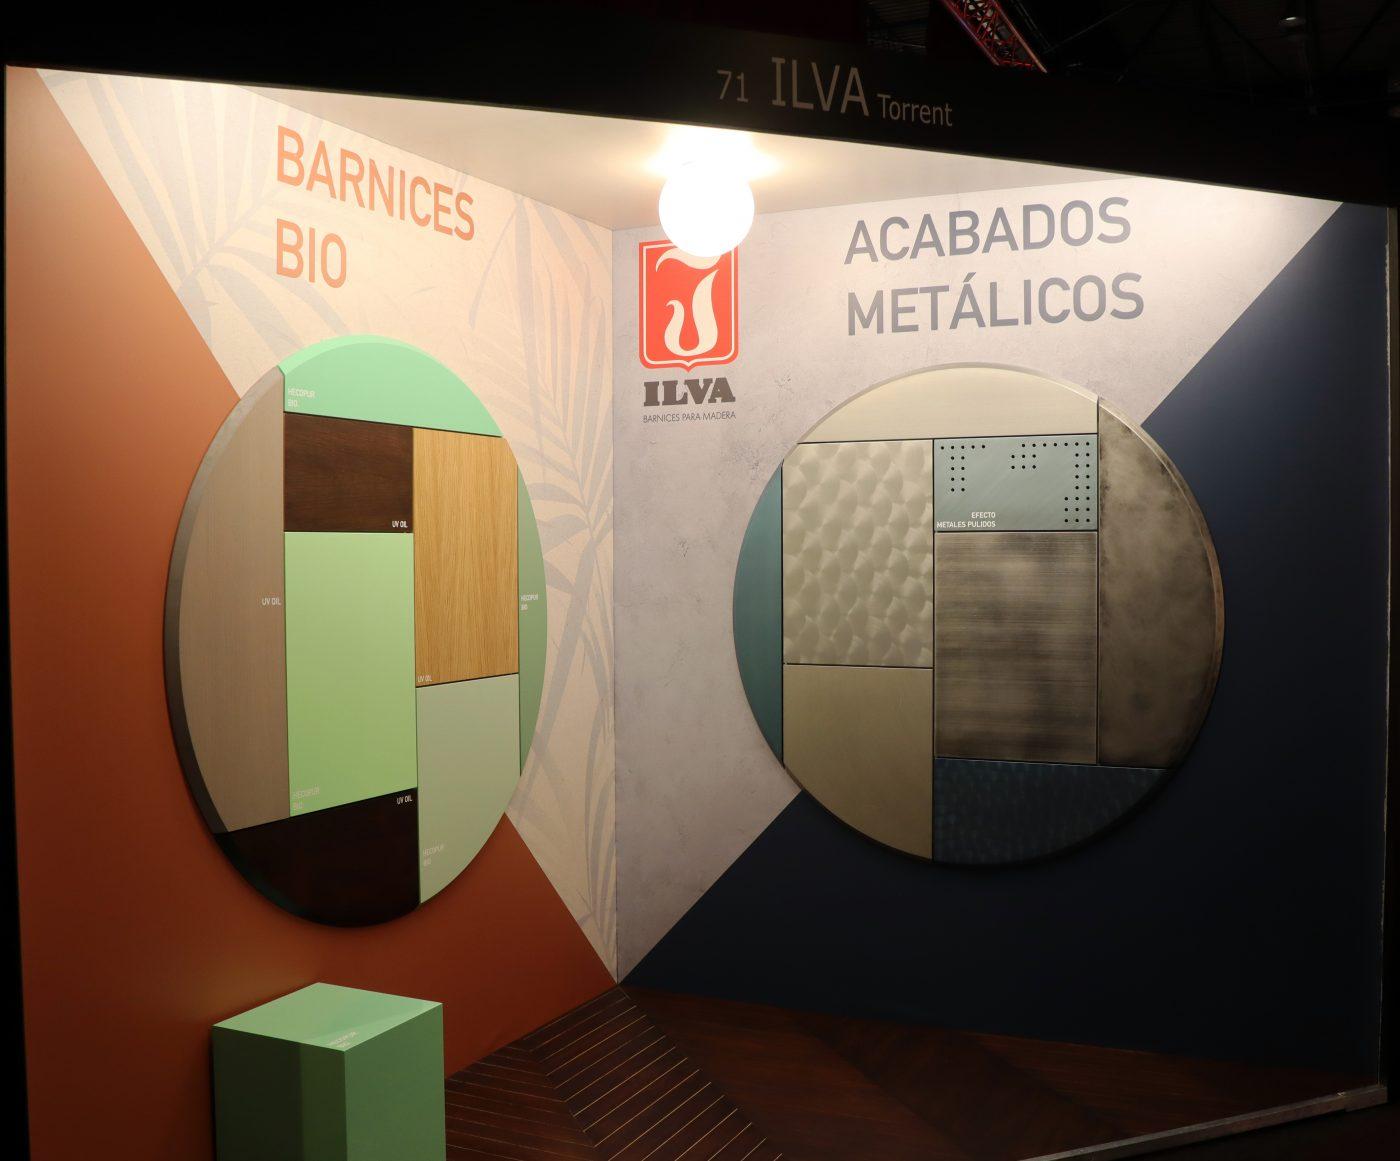 ILVA presentó en Architect&Work sus barnices BIO